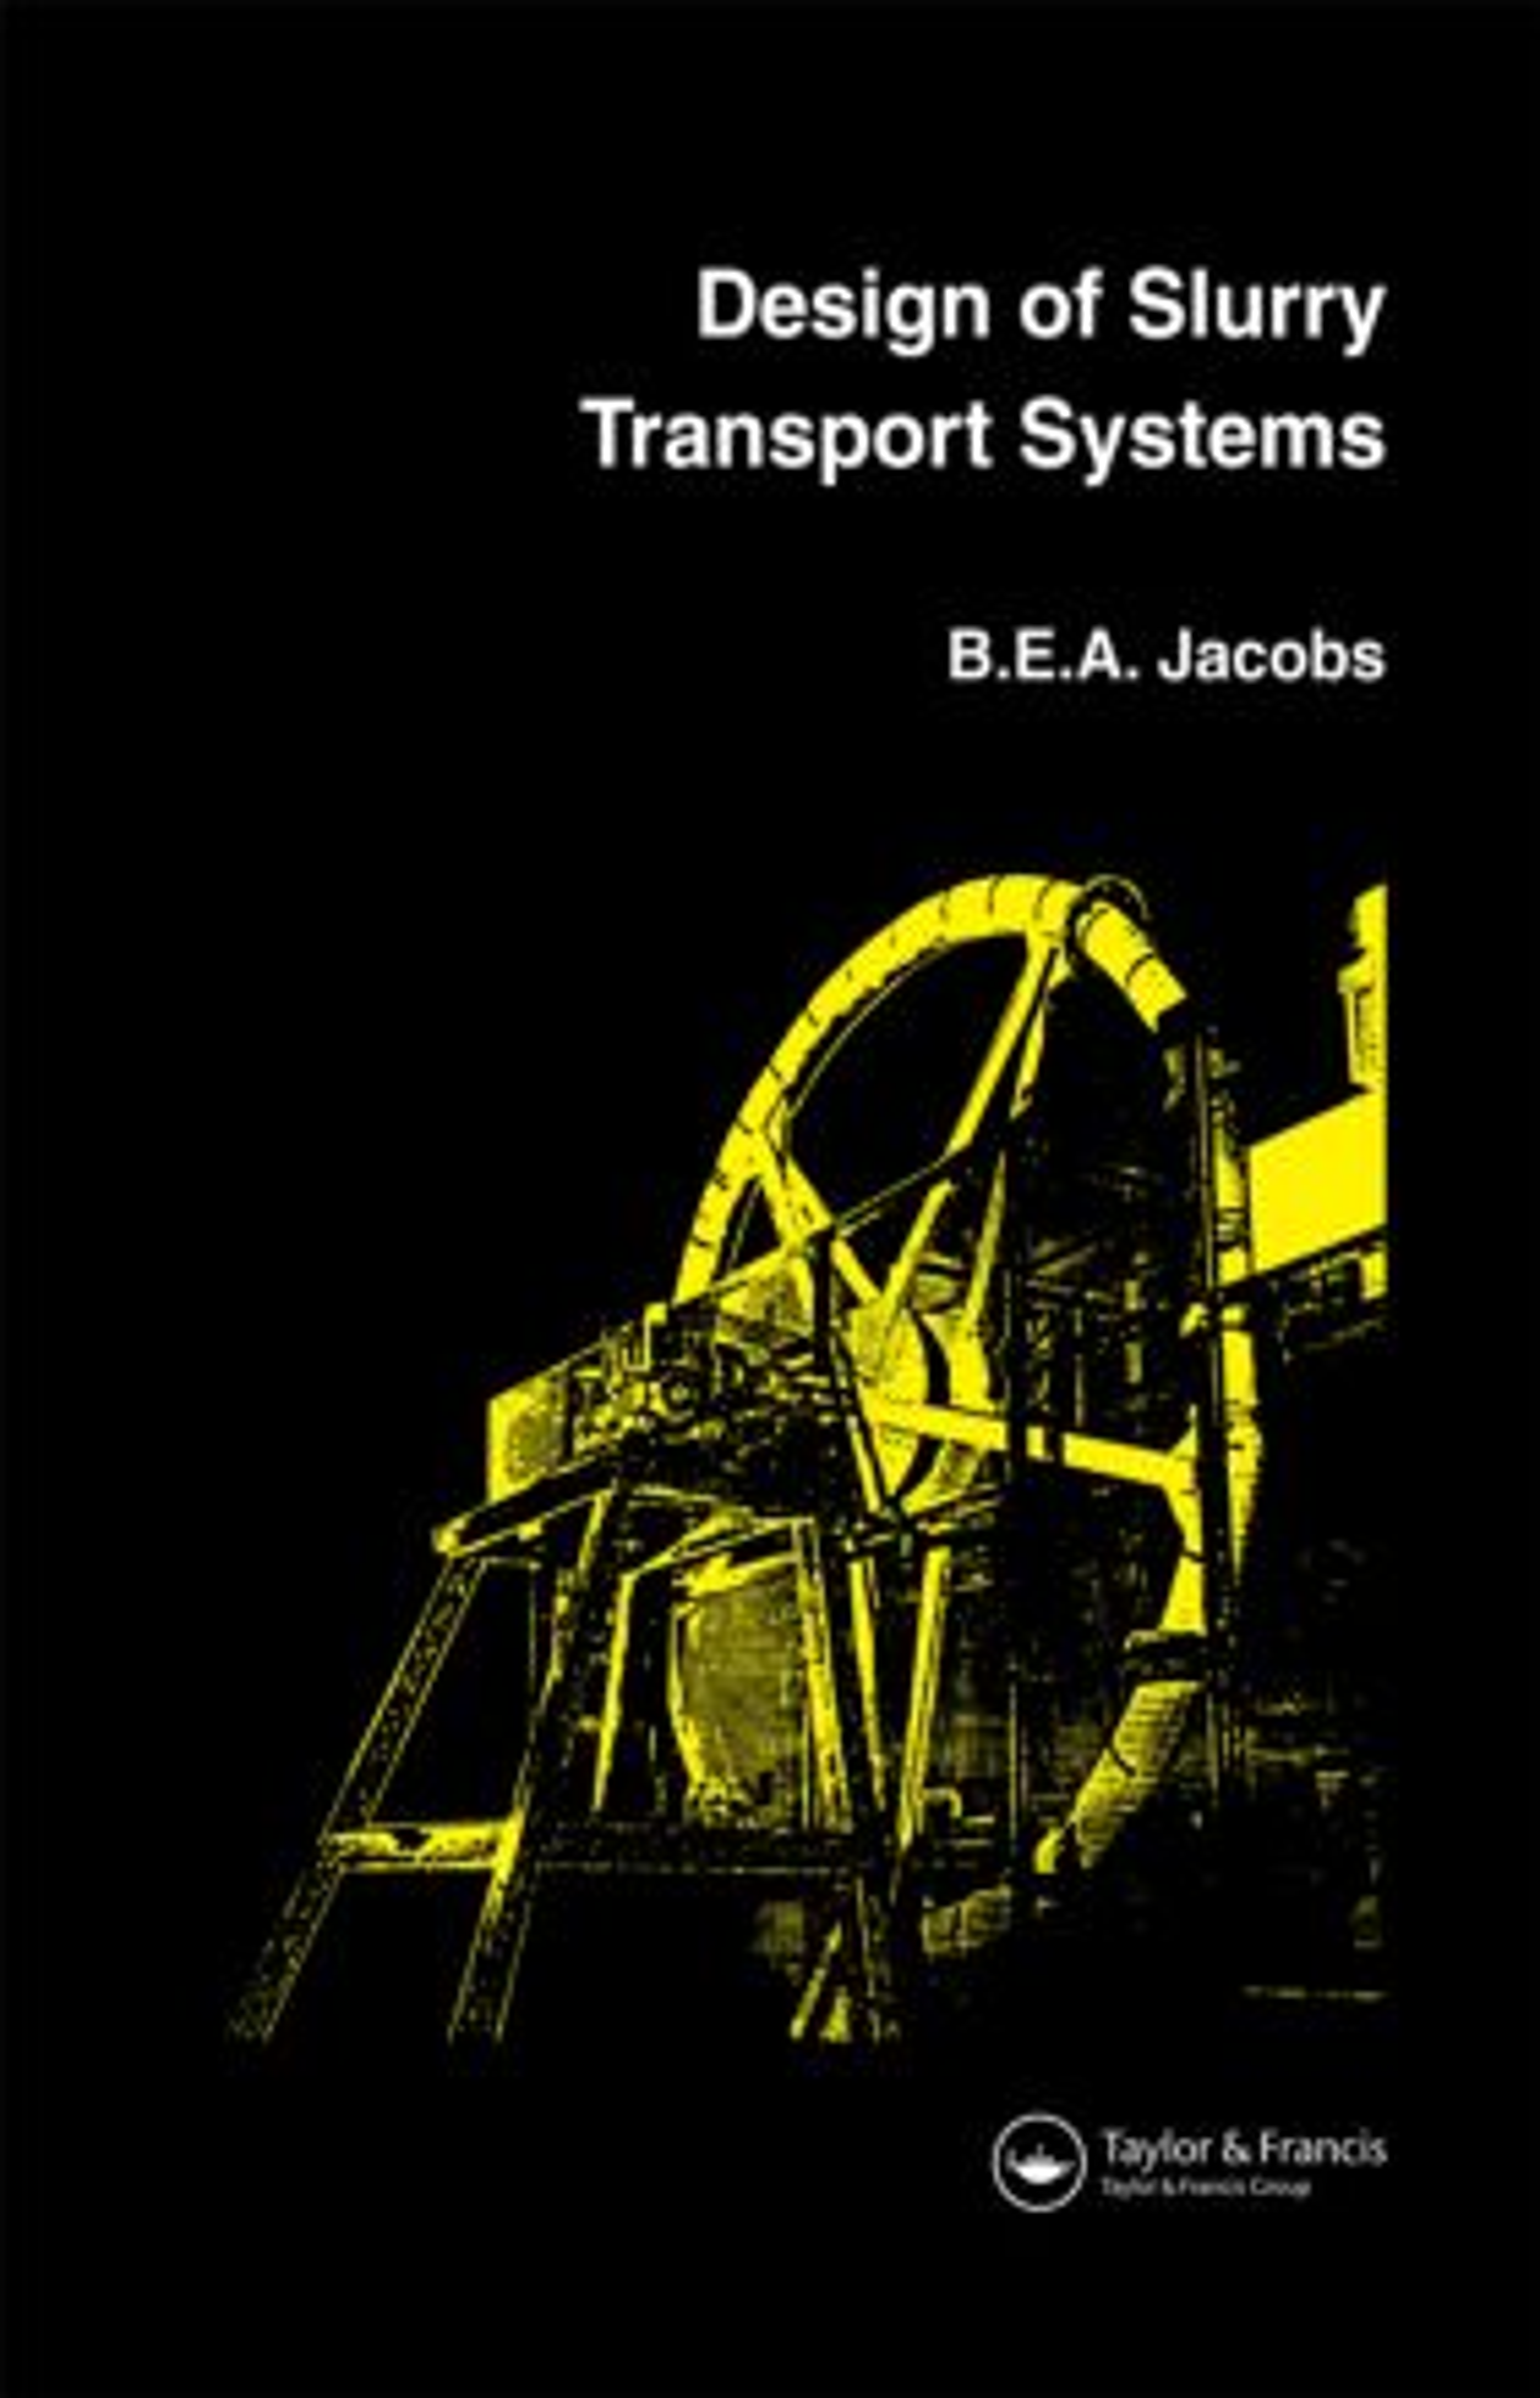 Design of Slurry Transport Systems: 1st Edition (Hardback) book cover